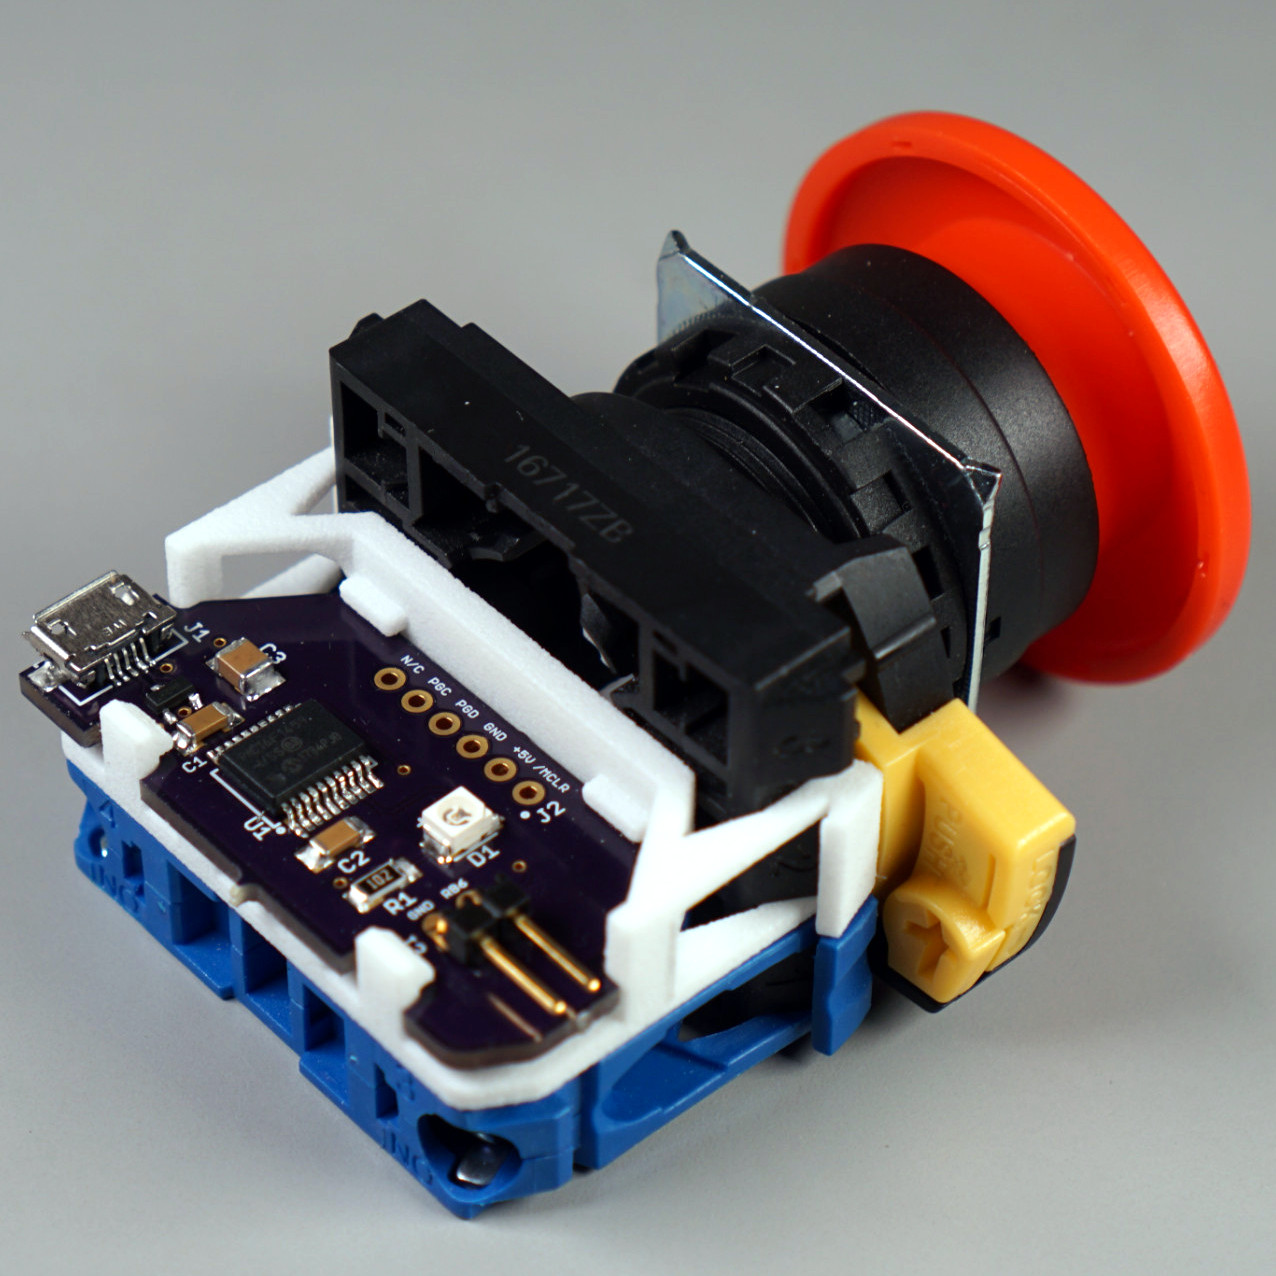 Side Driving Lights Light Cnc Machined Push Button Switch 12 Volt